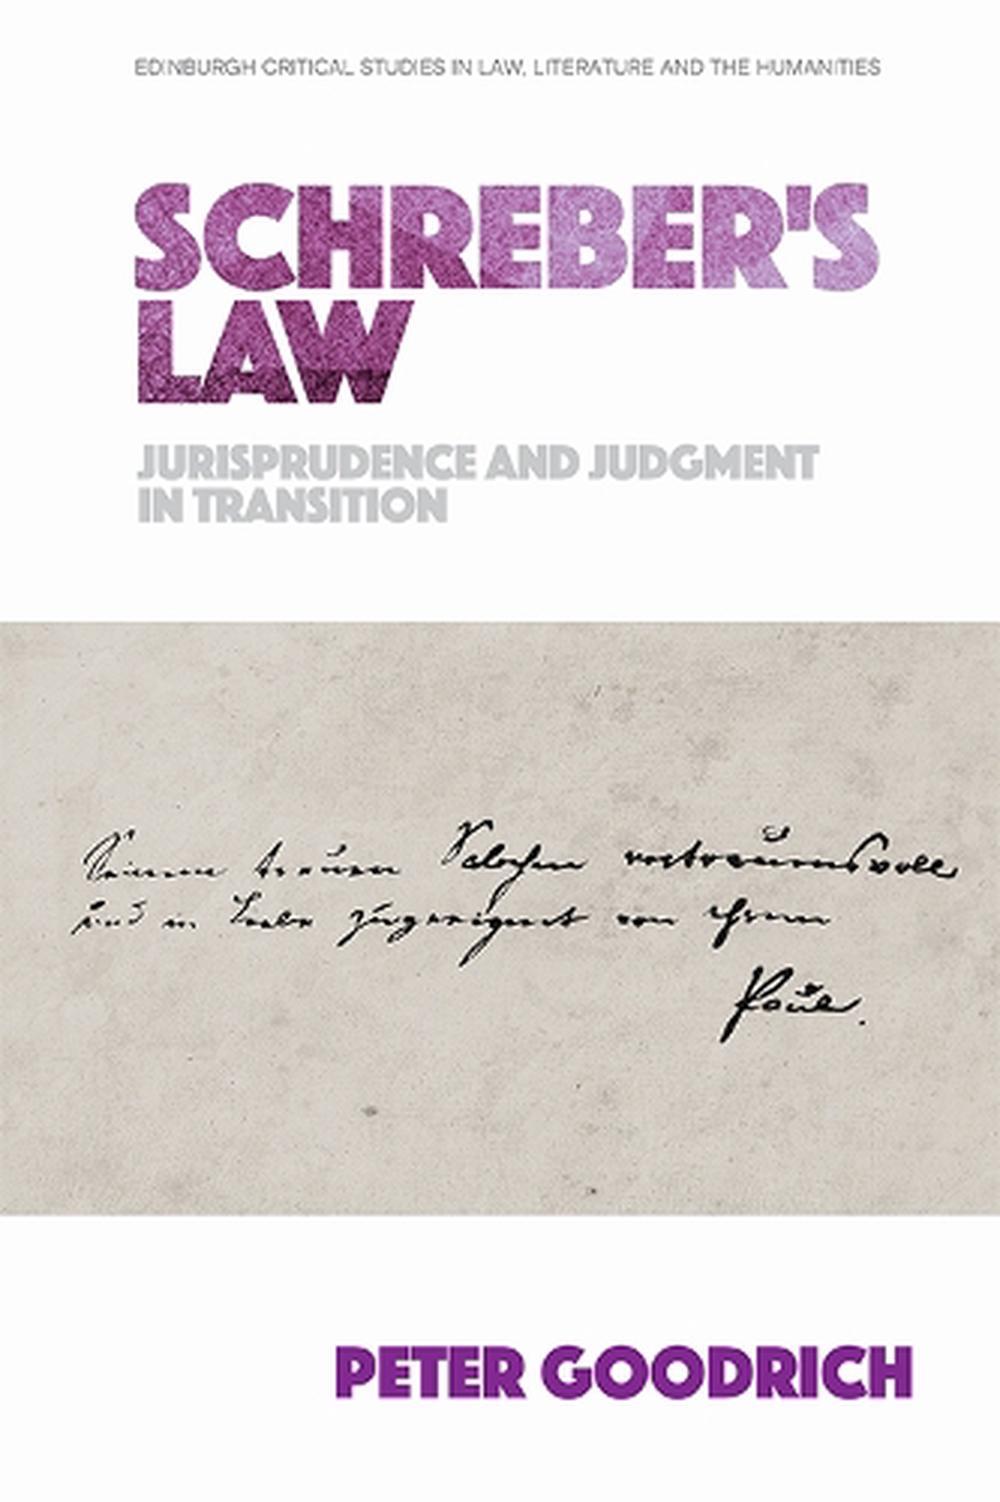 Jurisprudence: Theory & Context